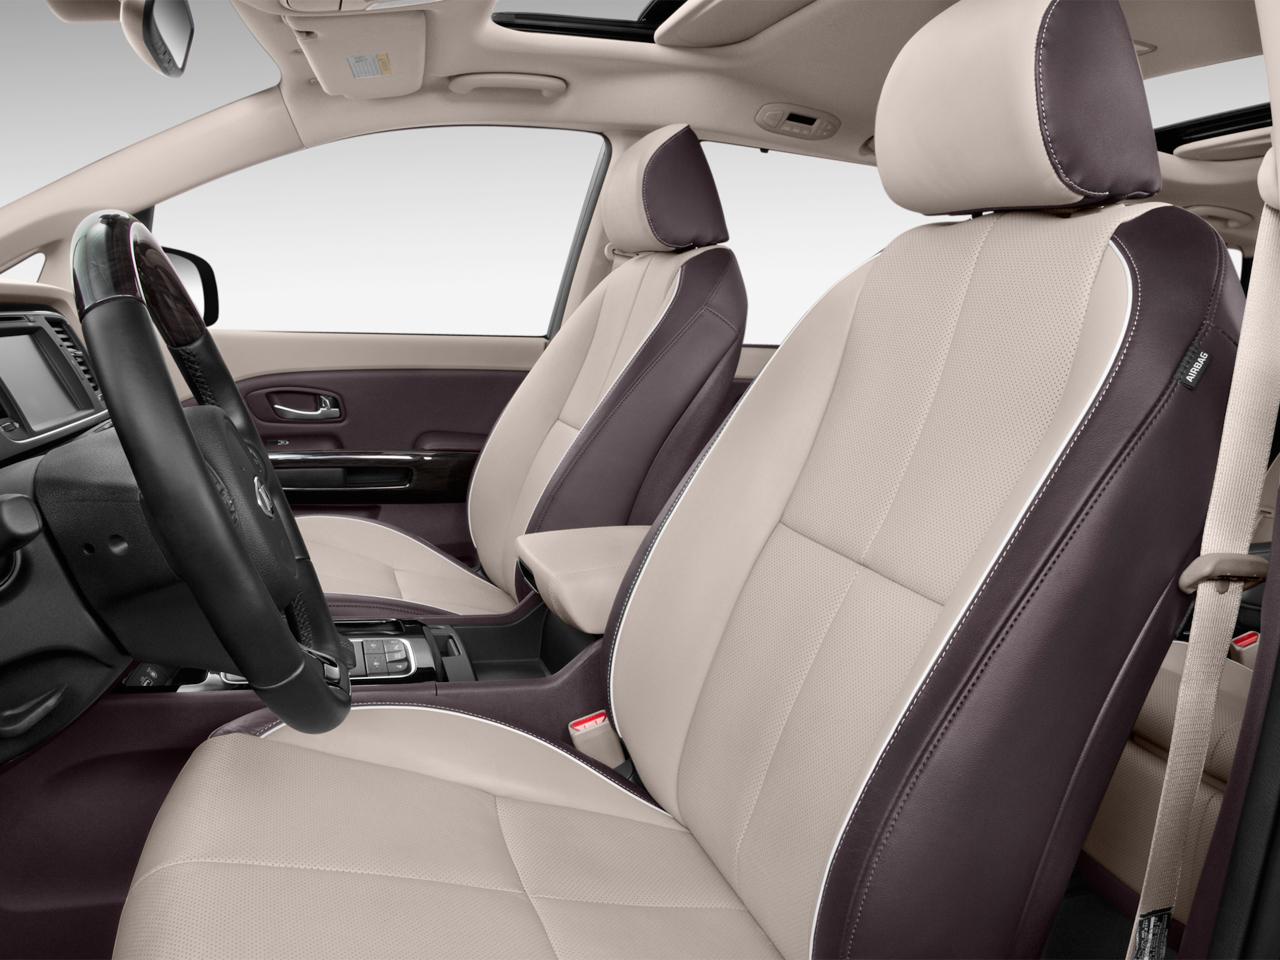 Đánh giá xe Kia Sedona 2016